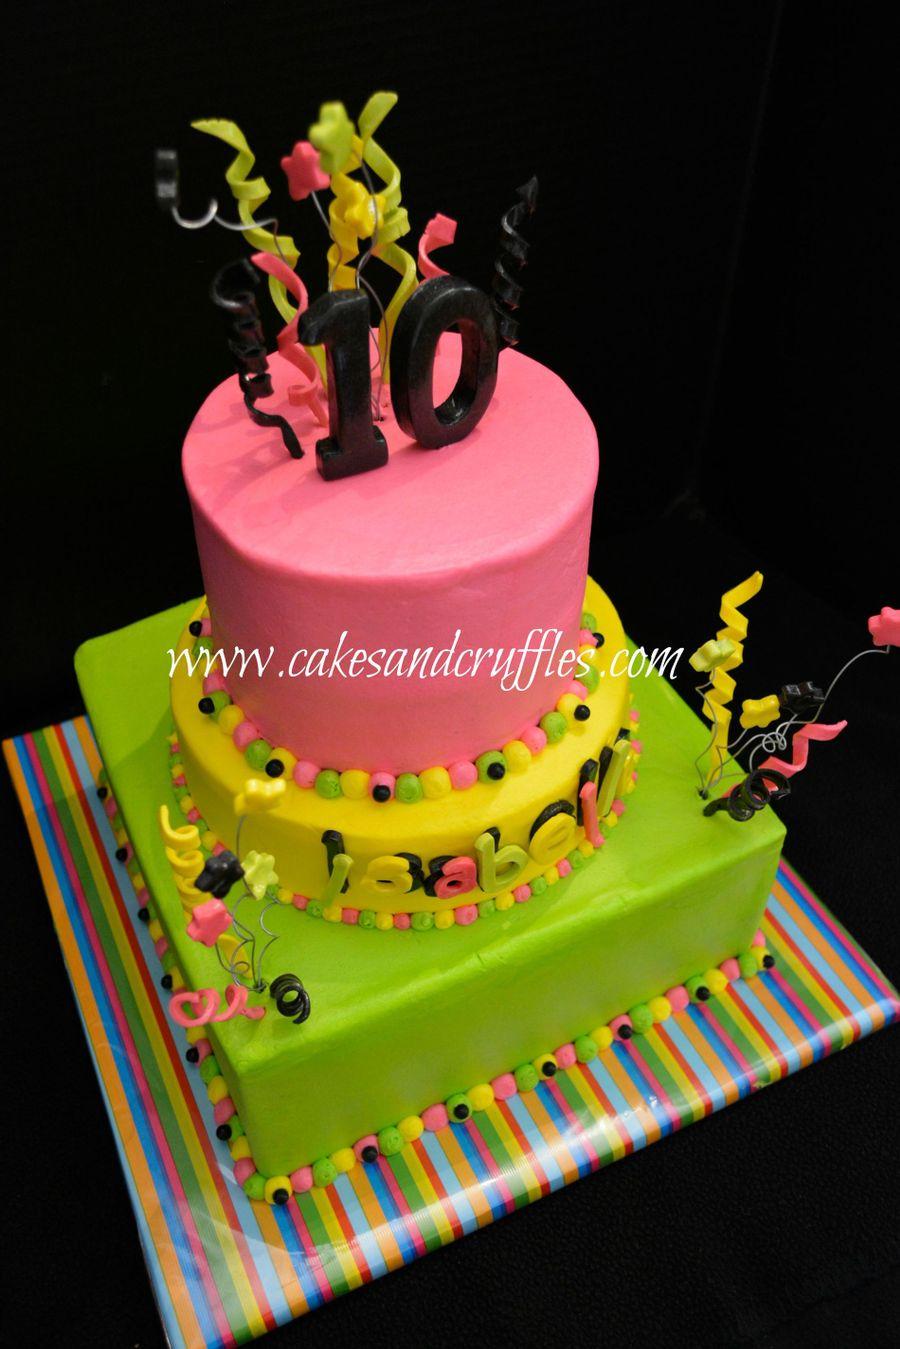 Glow in the Dark Cake Decorations